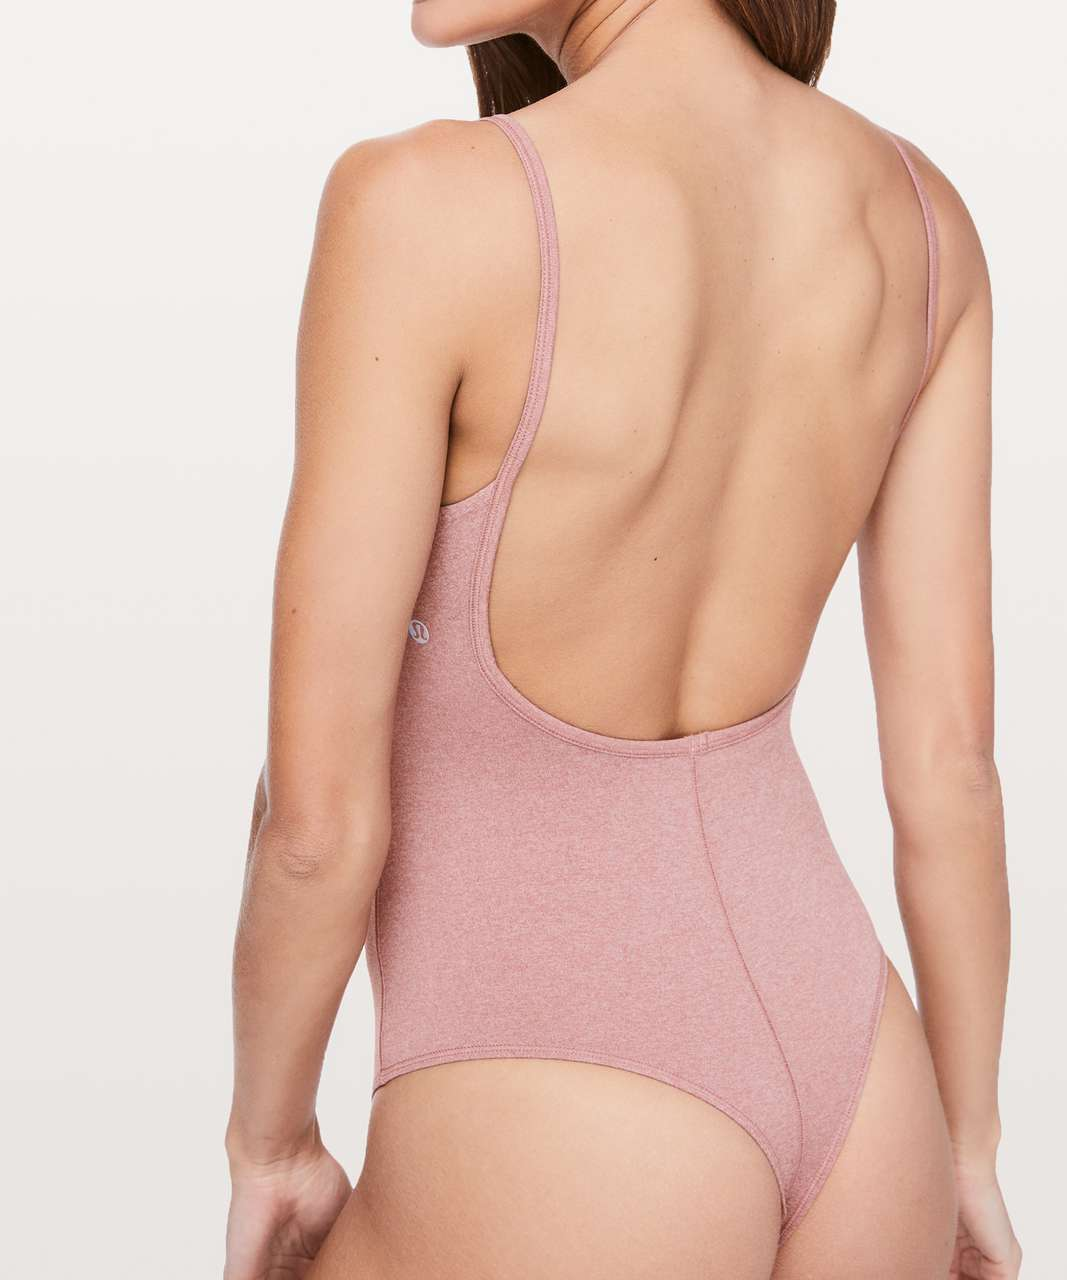 Lululemon Pretty Pursuit Bodysuit - Heathered Quicksand